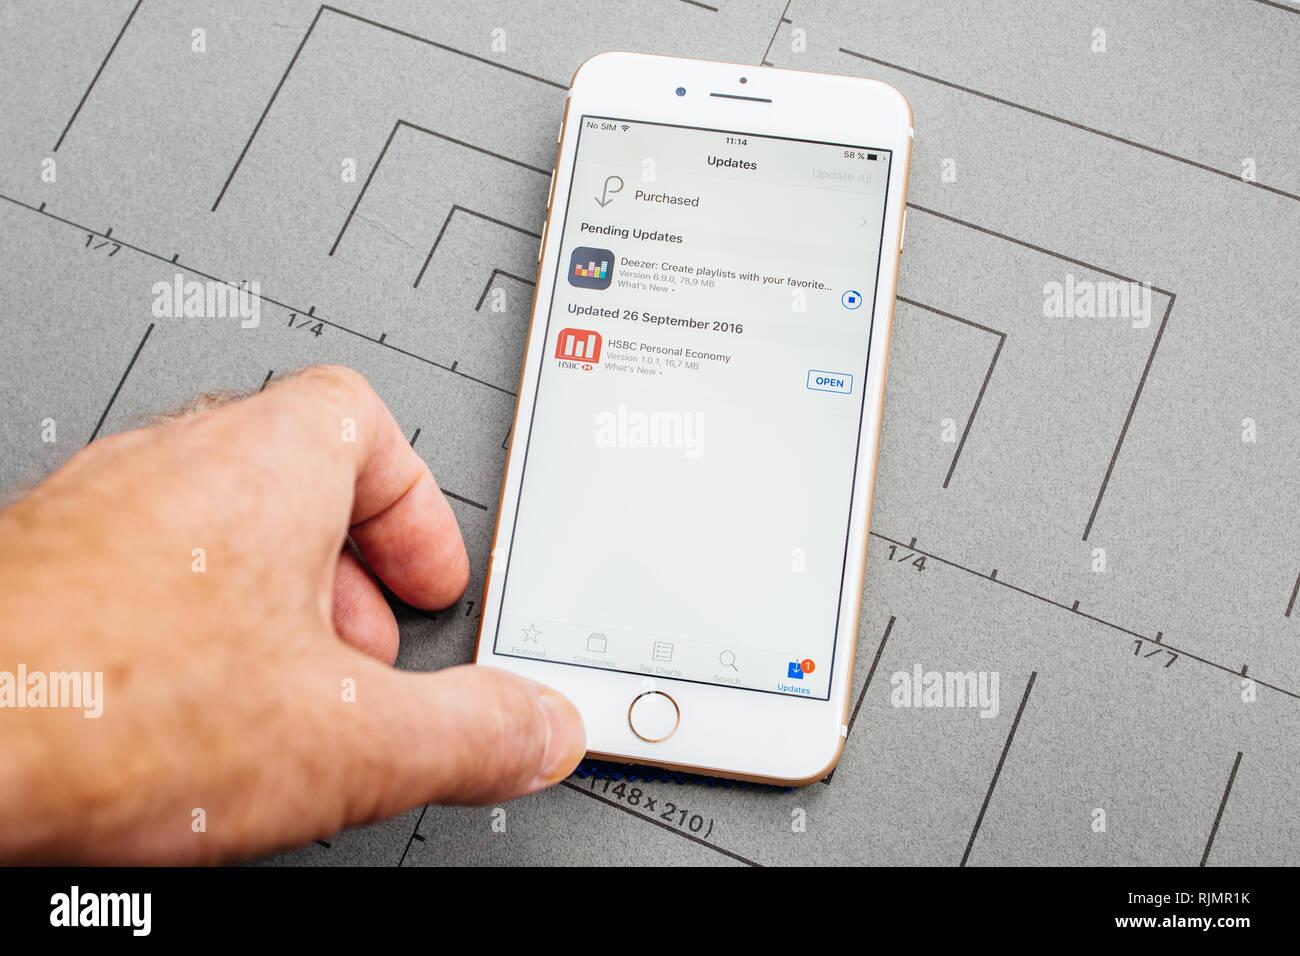 Hsbc Bank Mobile Banking App Stock Photos & Hsbc Bank Mobile Banking